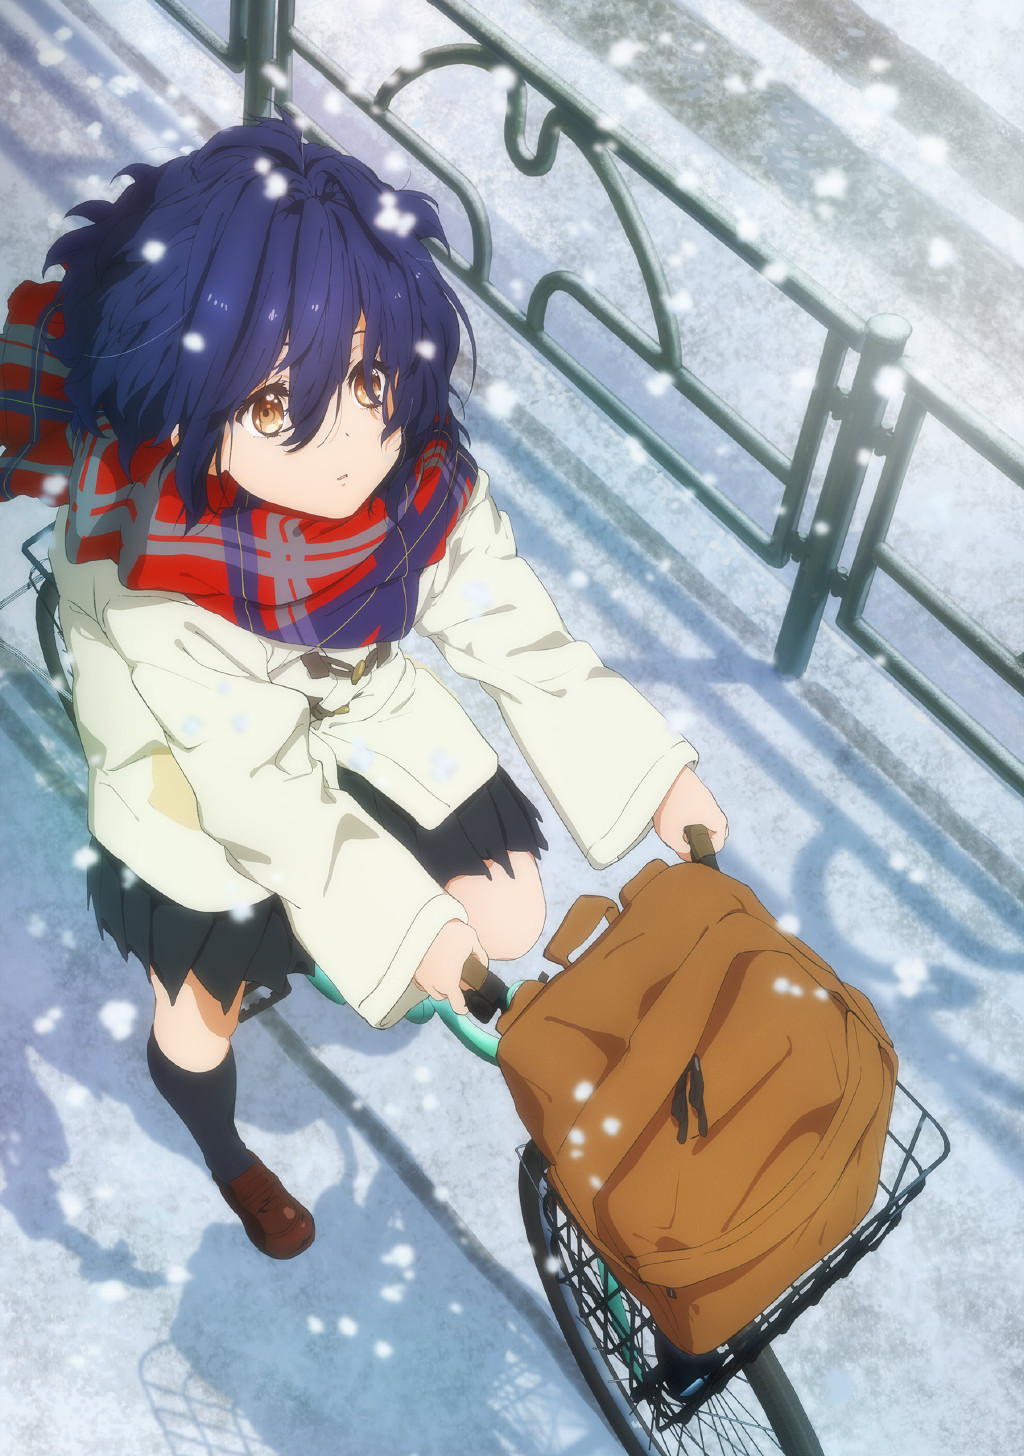 TV动画《22/7》第1弹PV公开,2020年1月放送- ACG17.COM